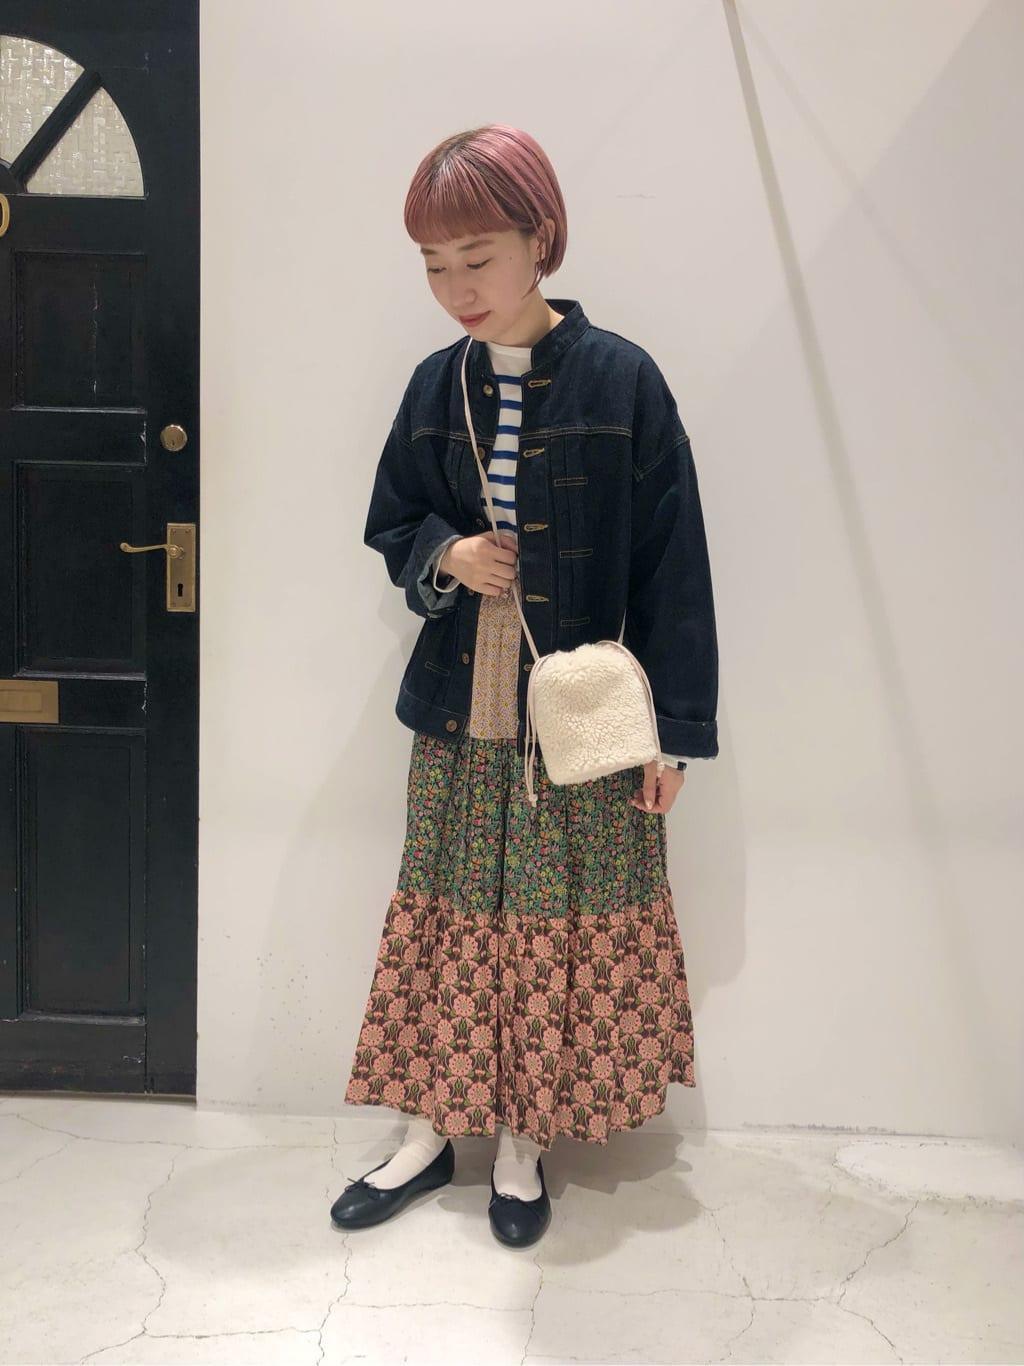 Dot and Stripes CHILD WOMAN ルクアイーレ 身長:157cm 2021.09.16